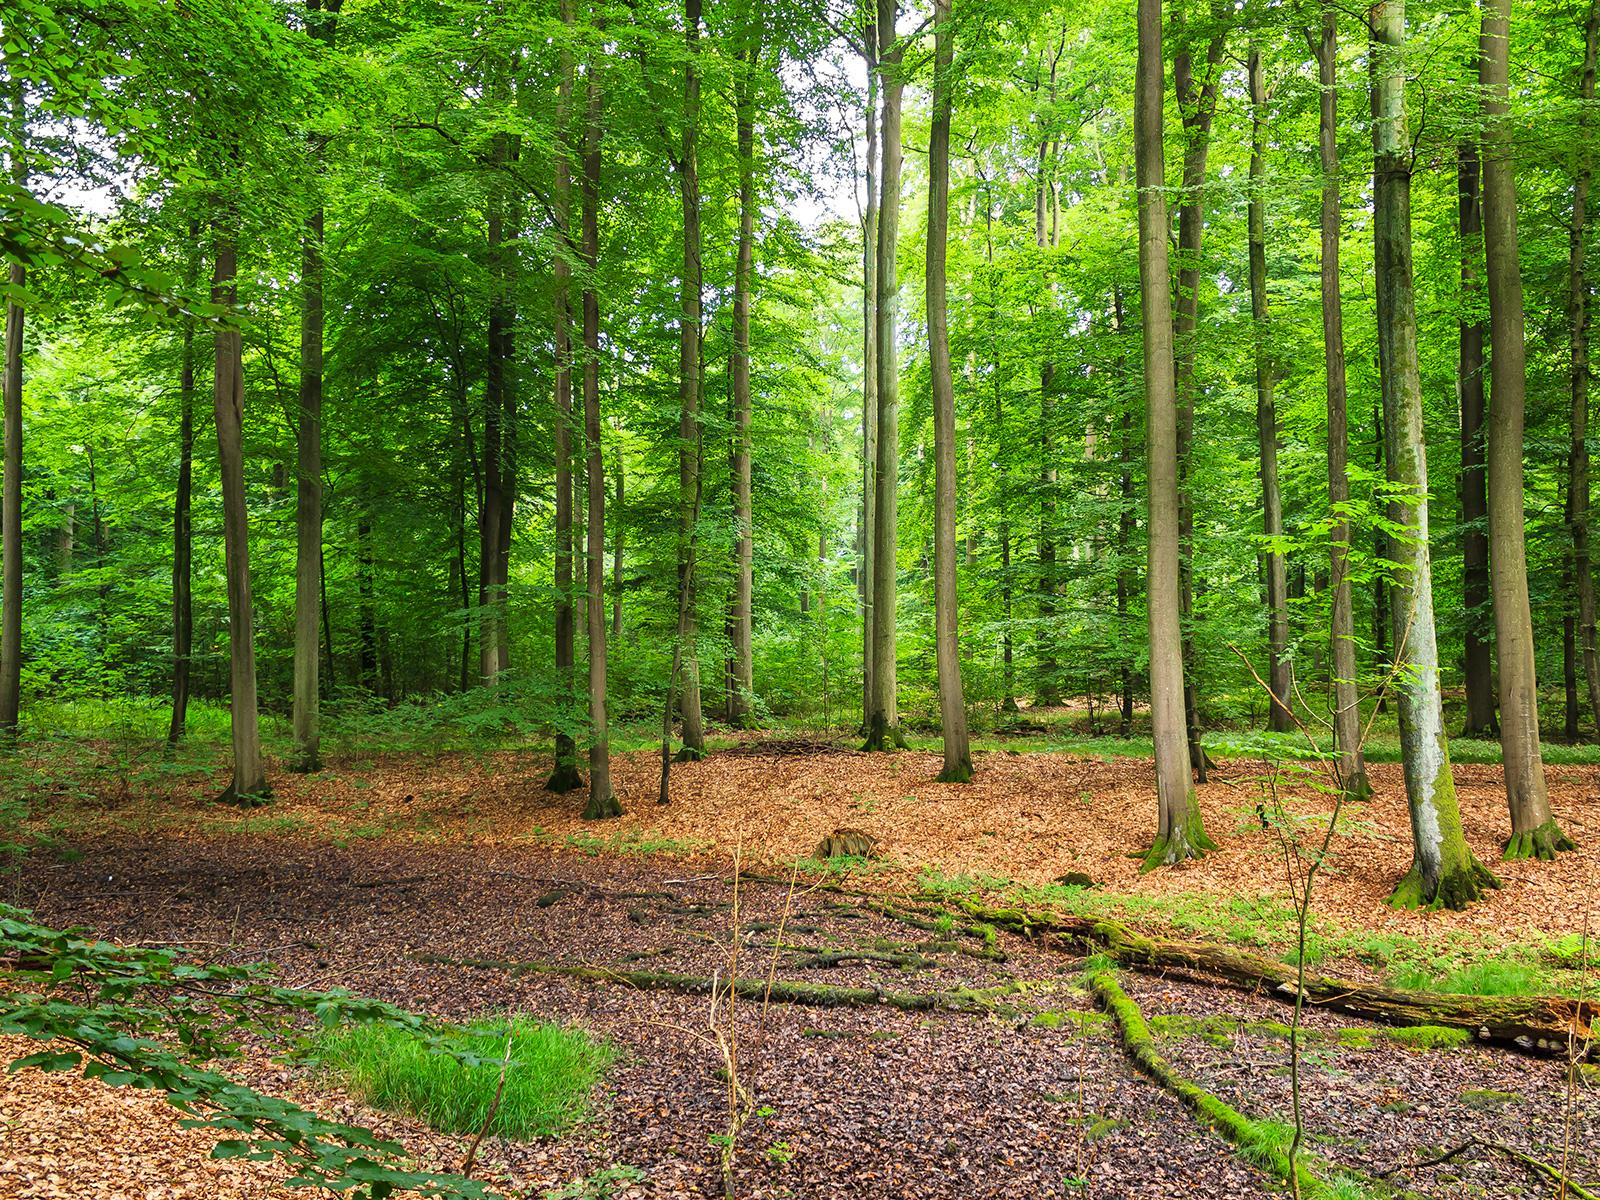 ausgetrockneter Tümpel im Wald